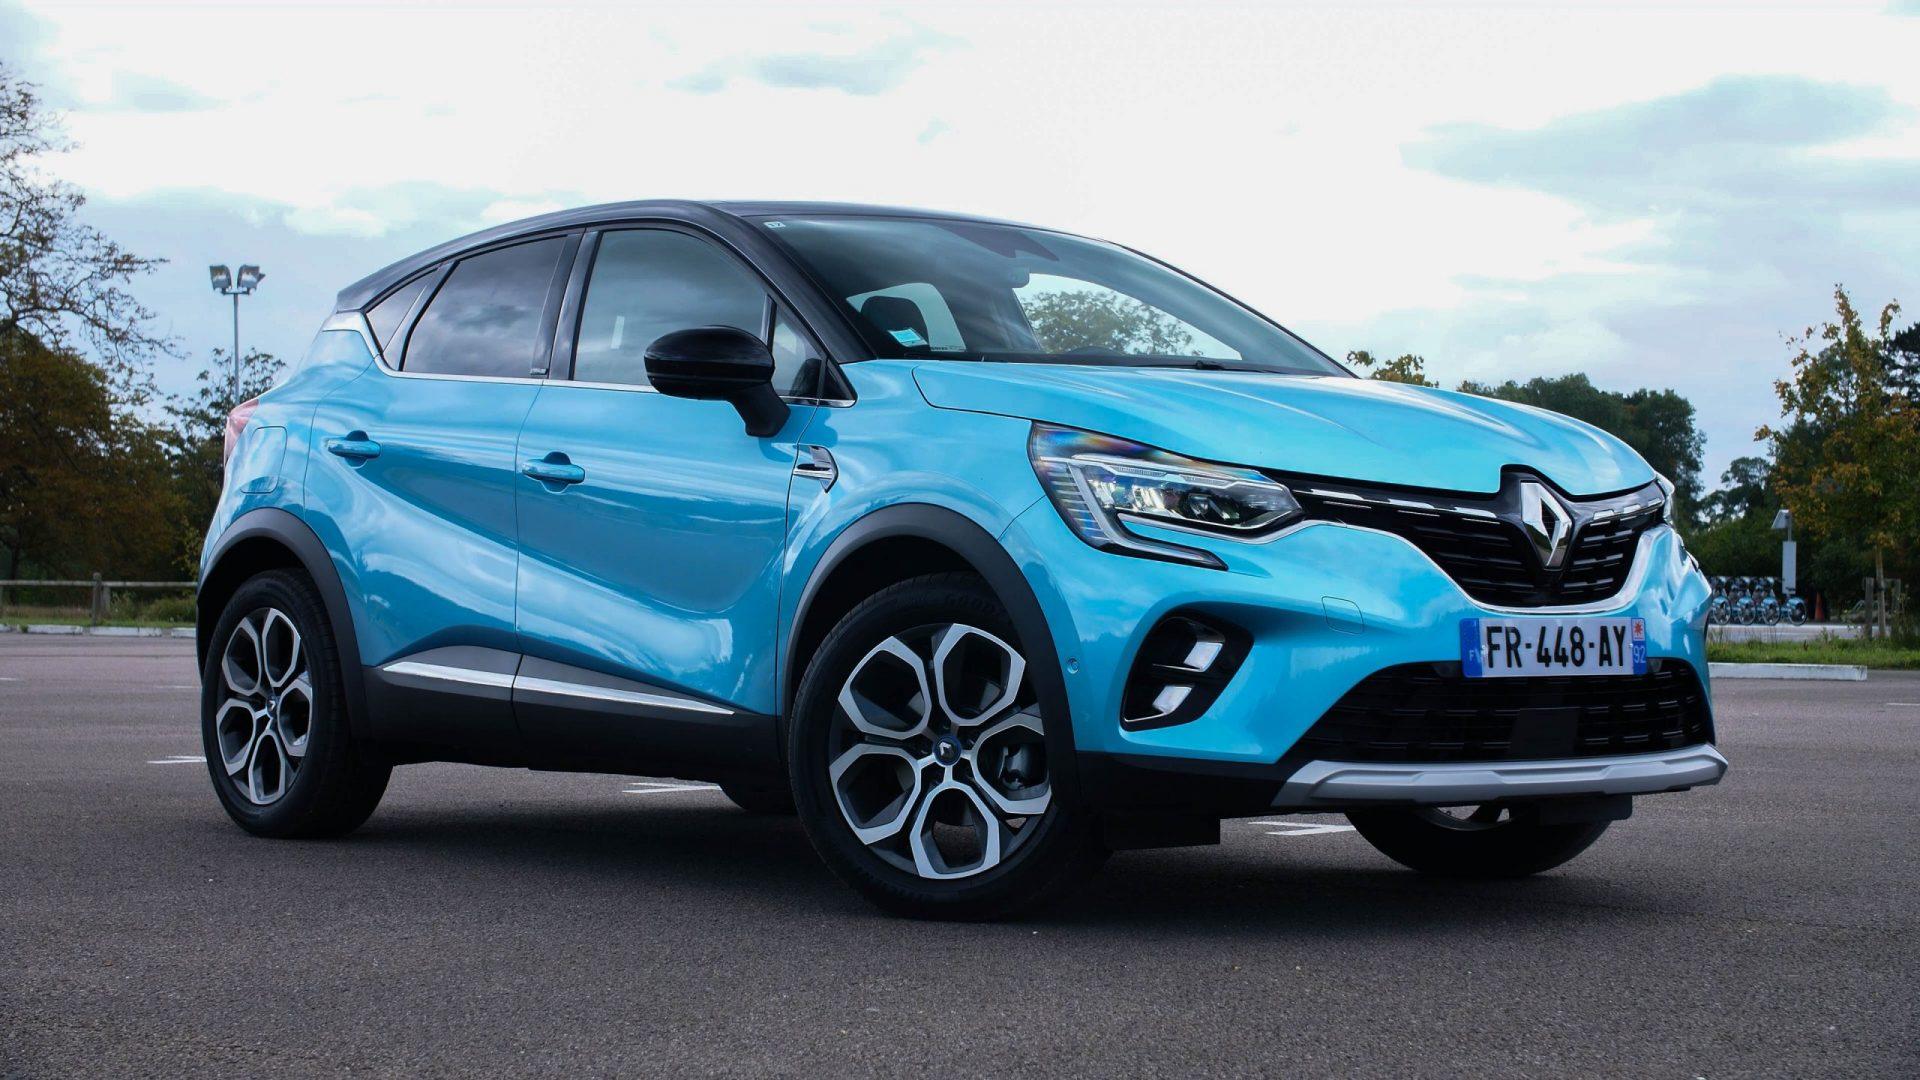 Renault Captur E-Tech hybrid review